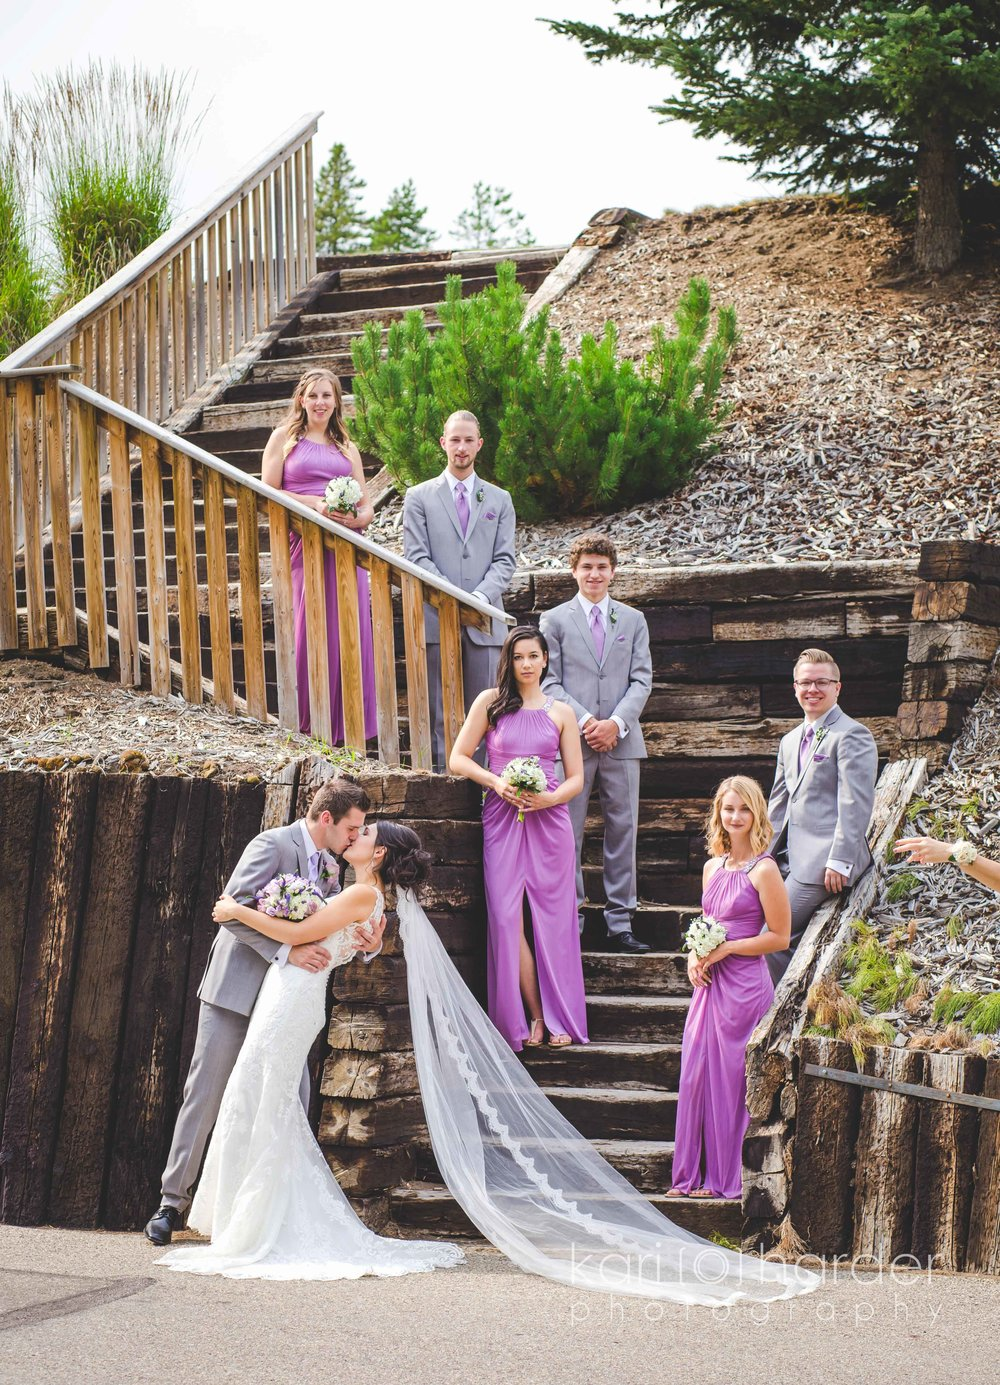 Wedding Party Formals-16.jpg